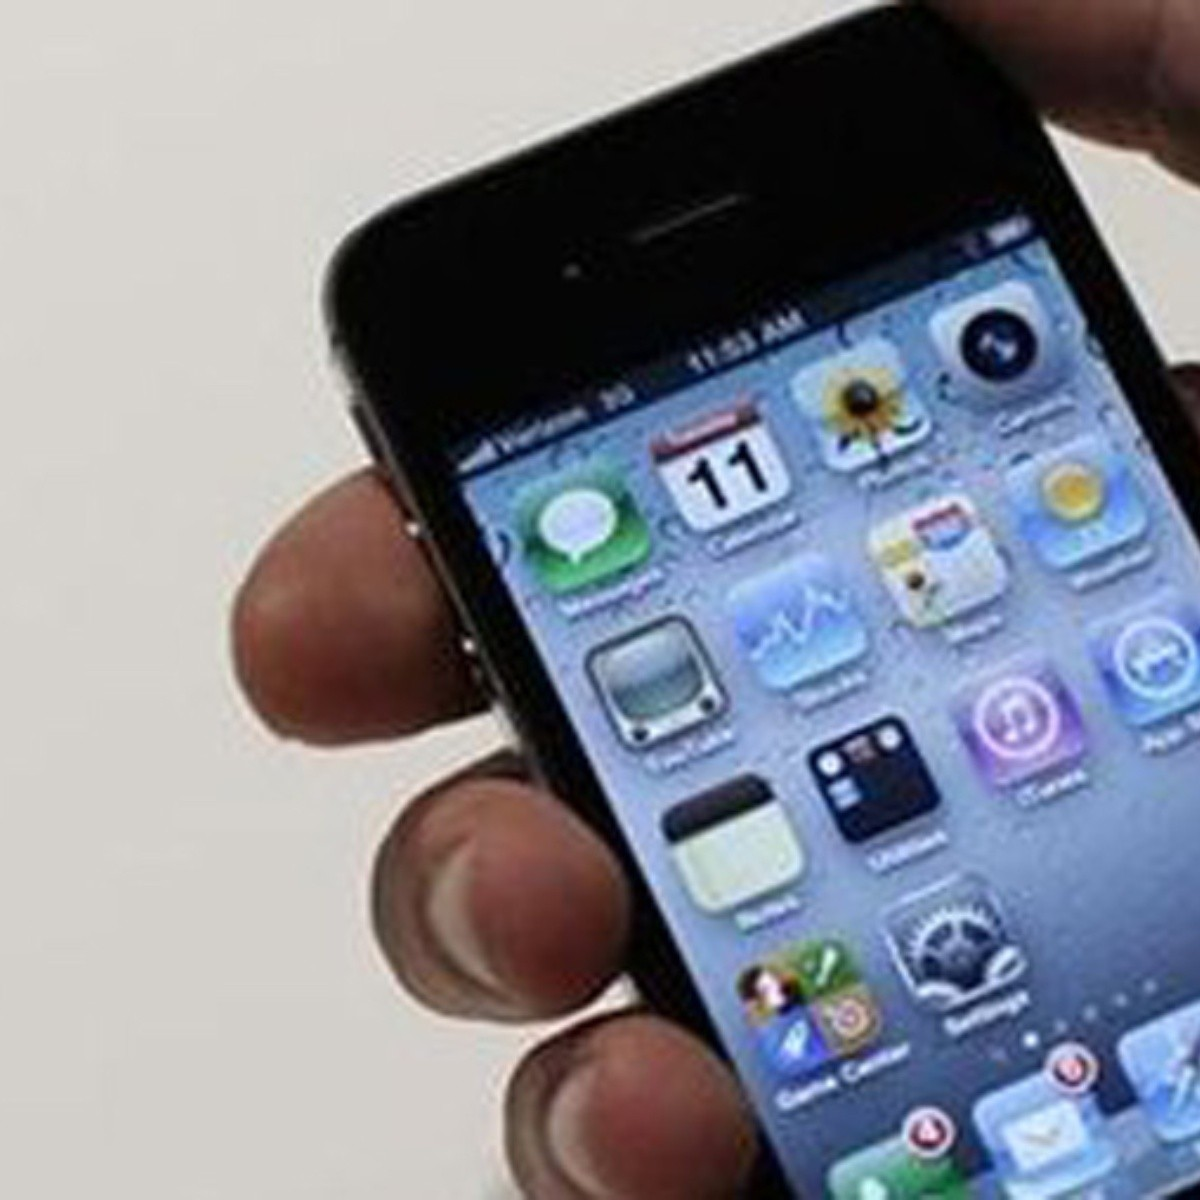 Excepcional Aplicación De Creación De Currículums Gratis Para Iphone ...